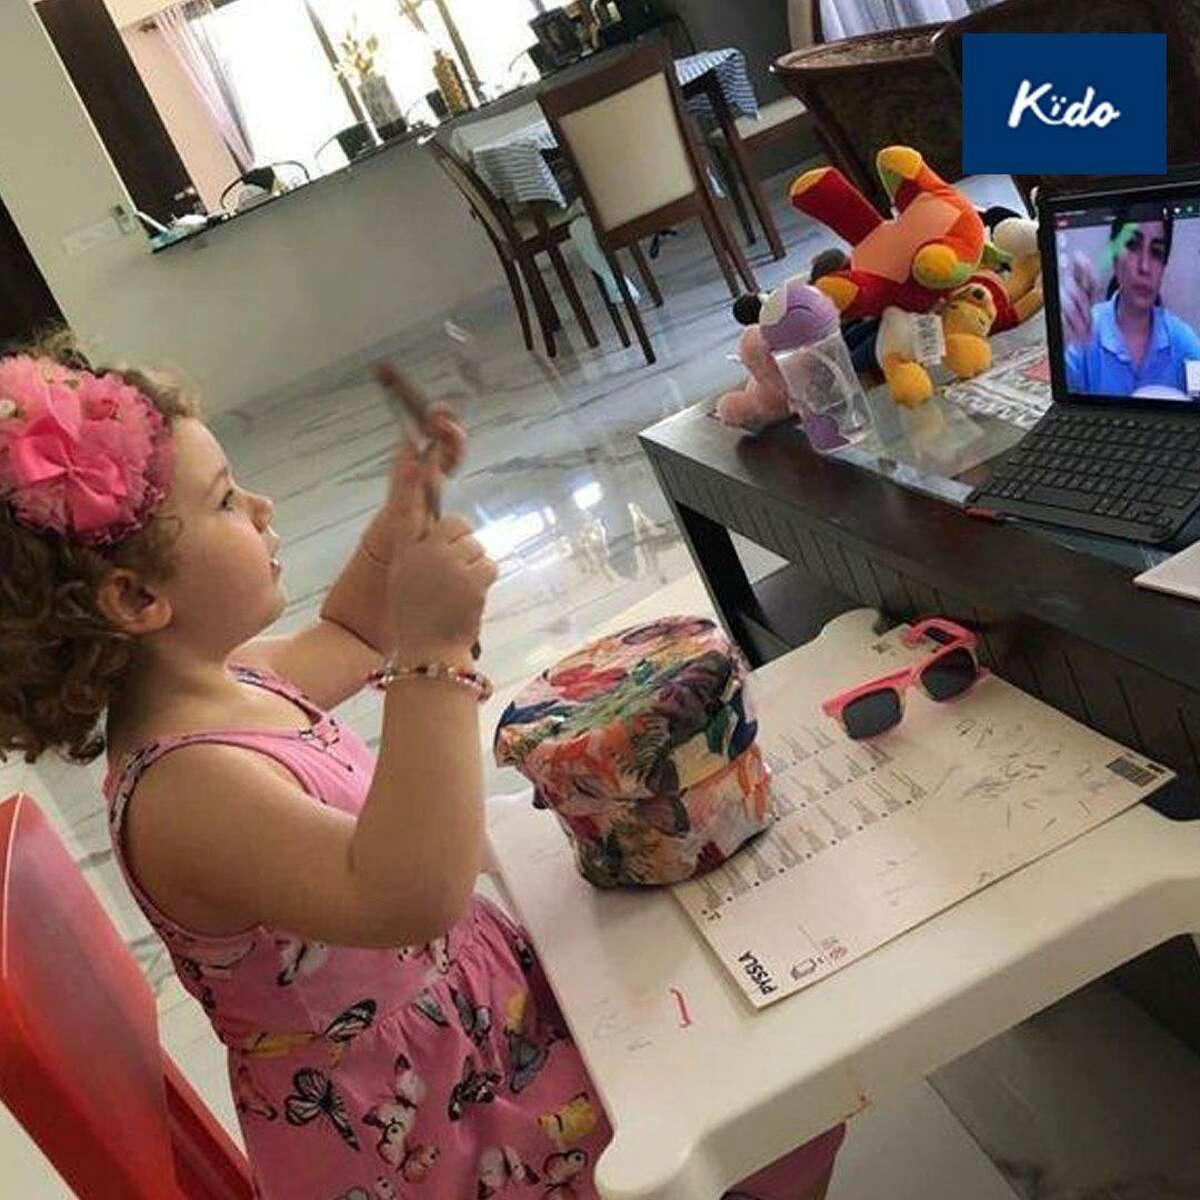 Kïdo Home's virtual learning hopes to achieve a true virtual global classroom for preschoolers.